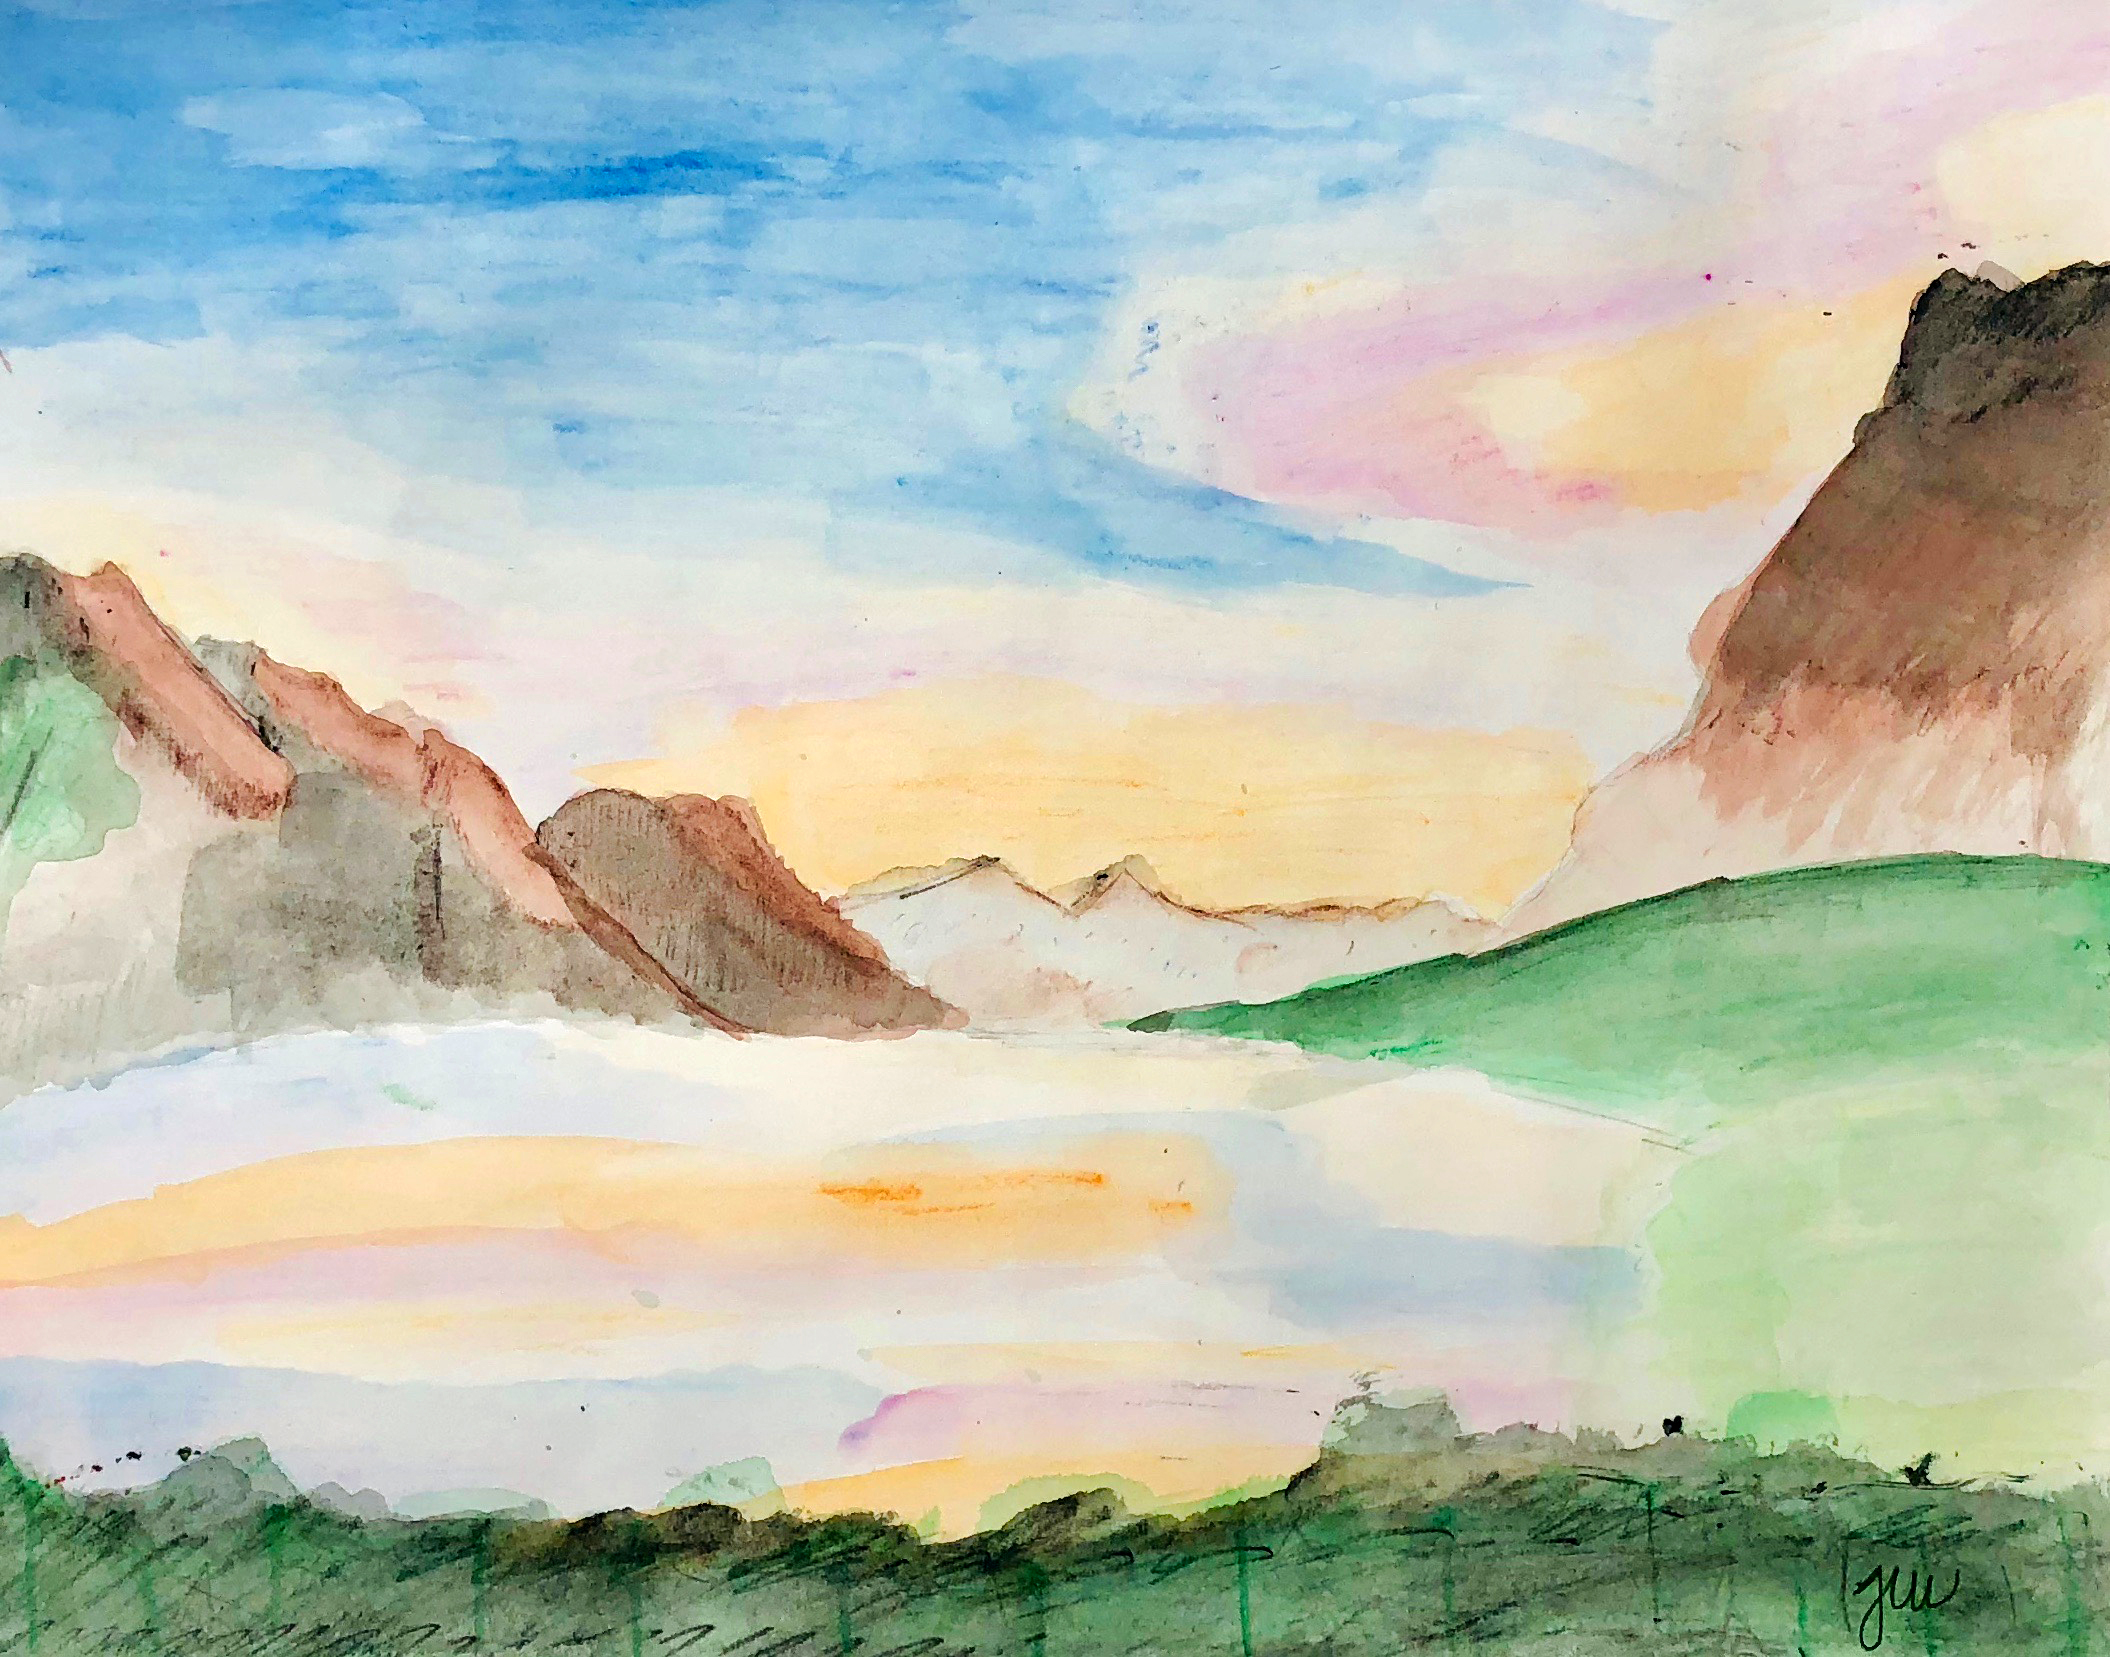 Jun W, grade 8, Watercolor. Week of Dec 3.